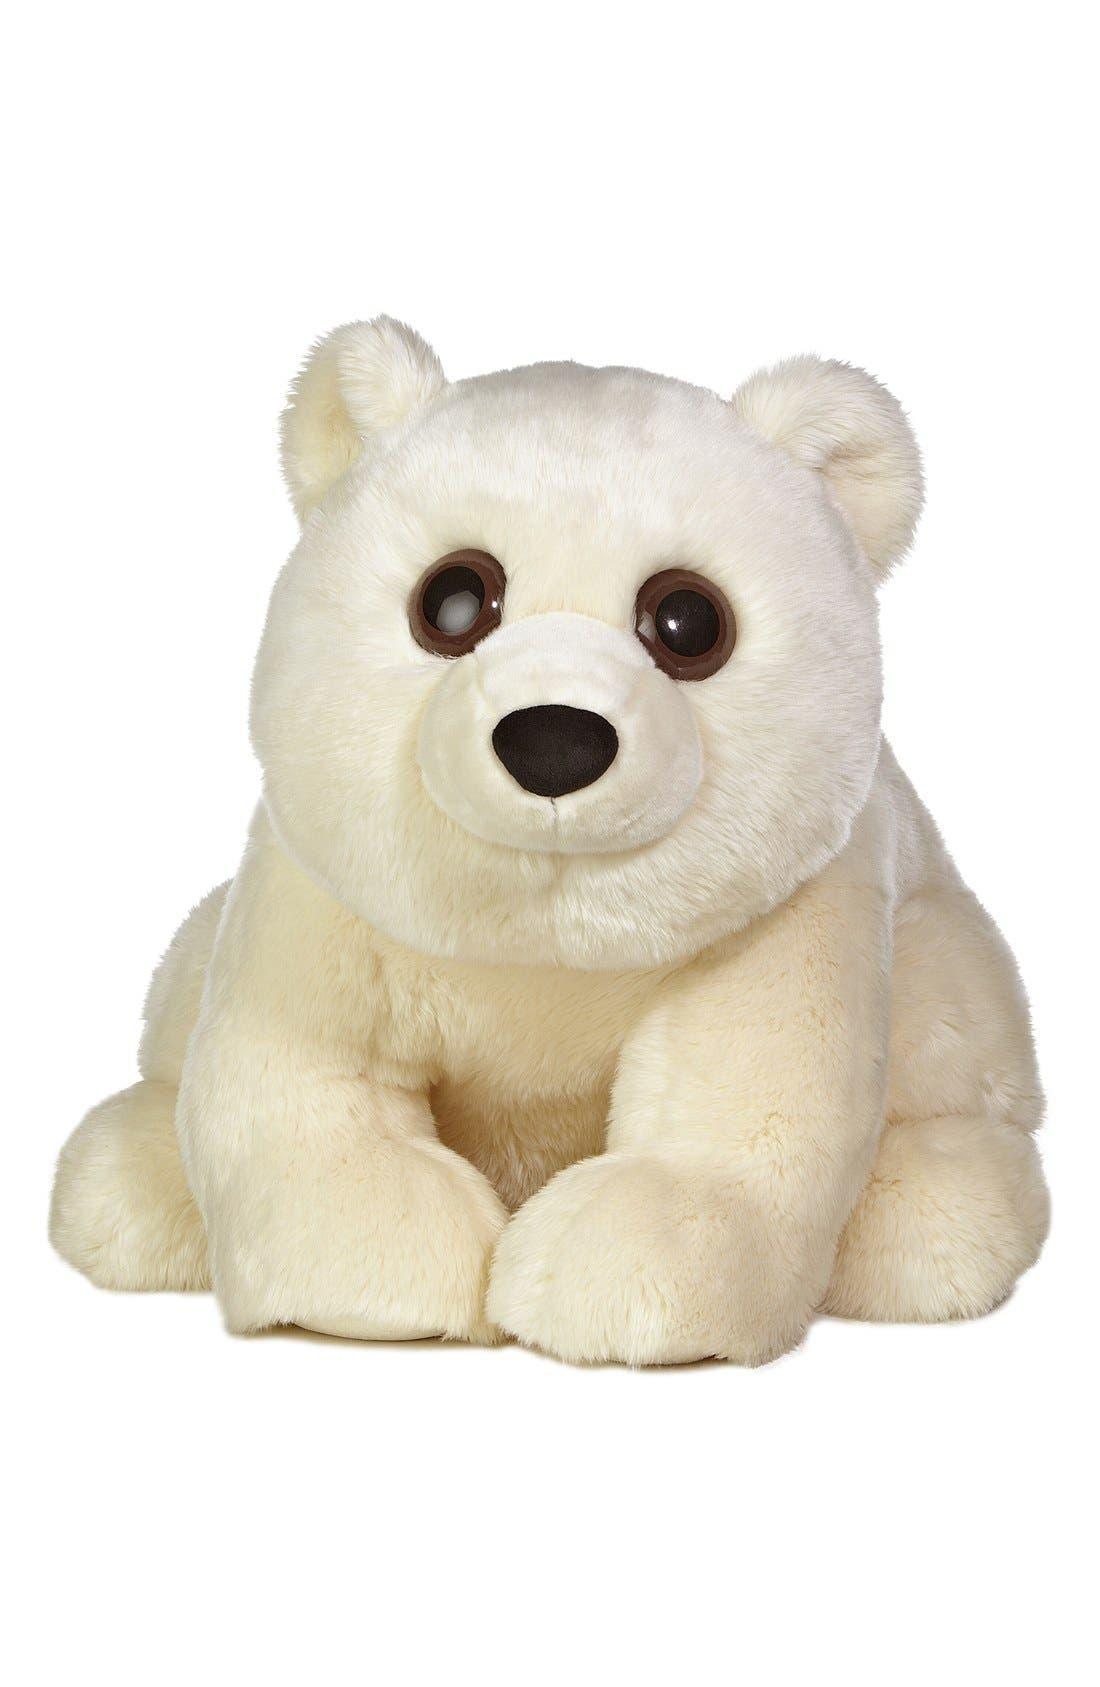 Alternate Image 1 Selected - Aurora World Toys 'Americana Bears - Arctic Polar Bear' Stuffed Animal